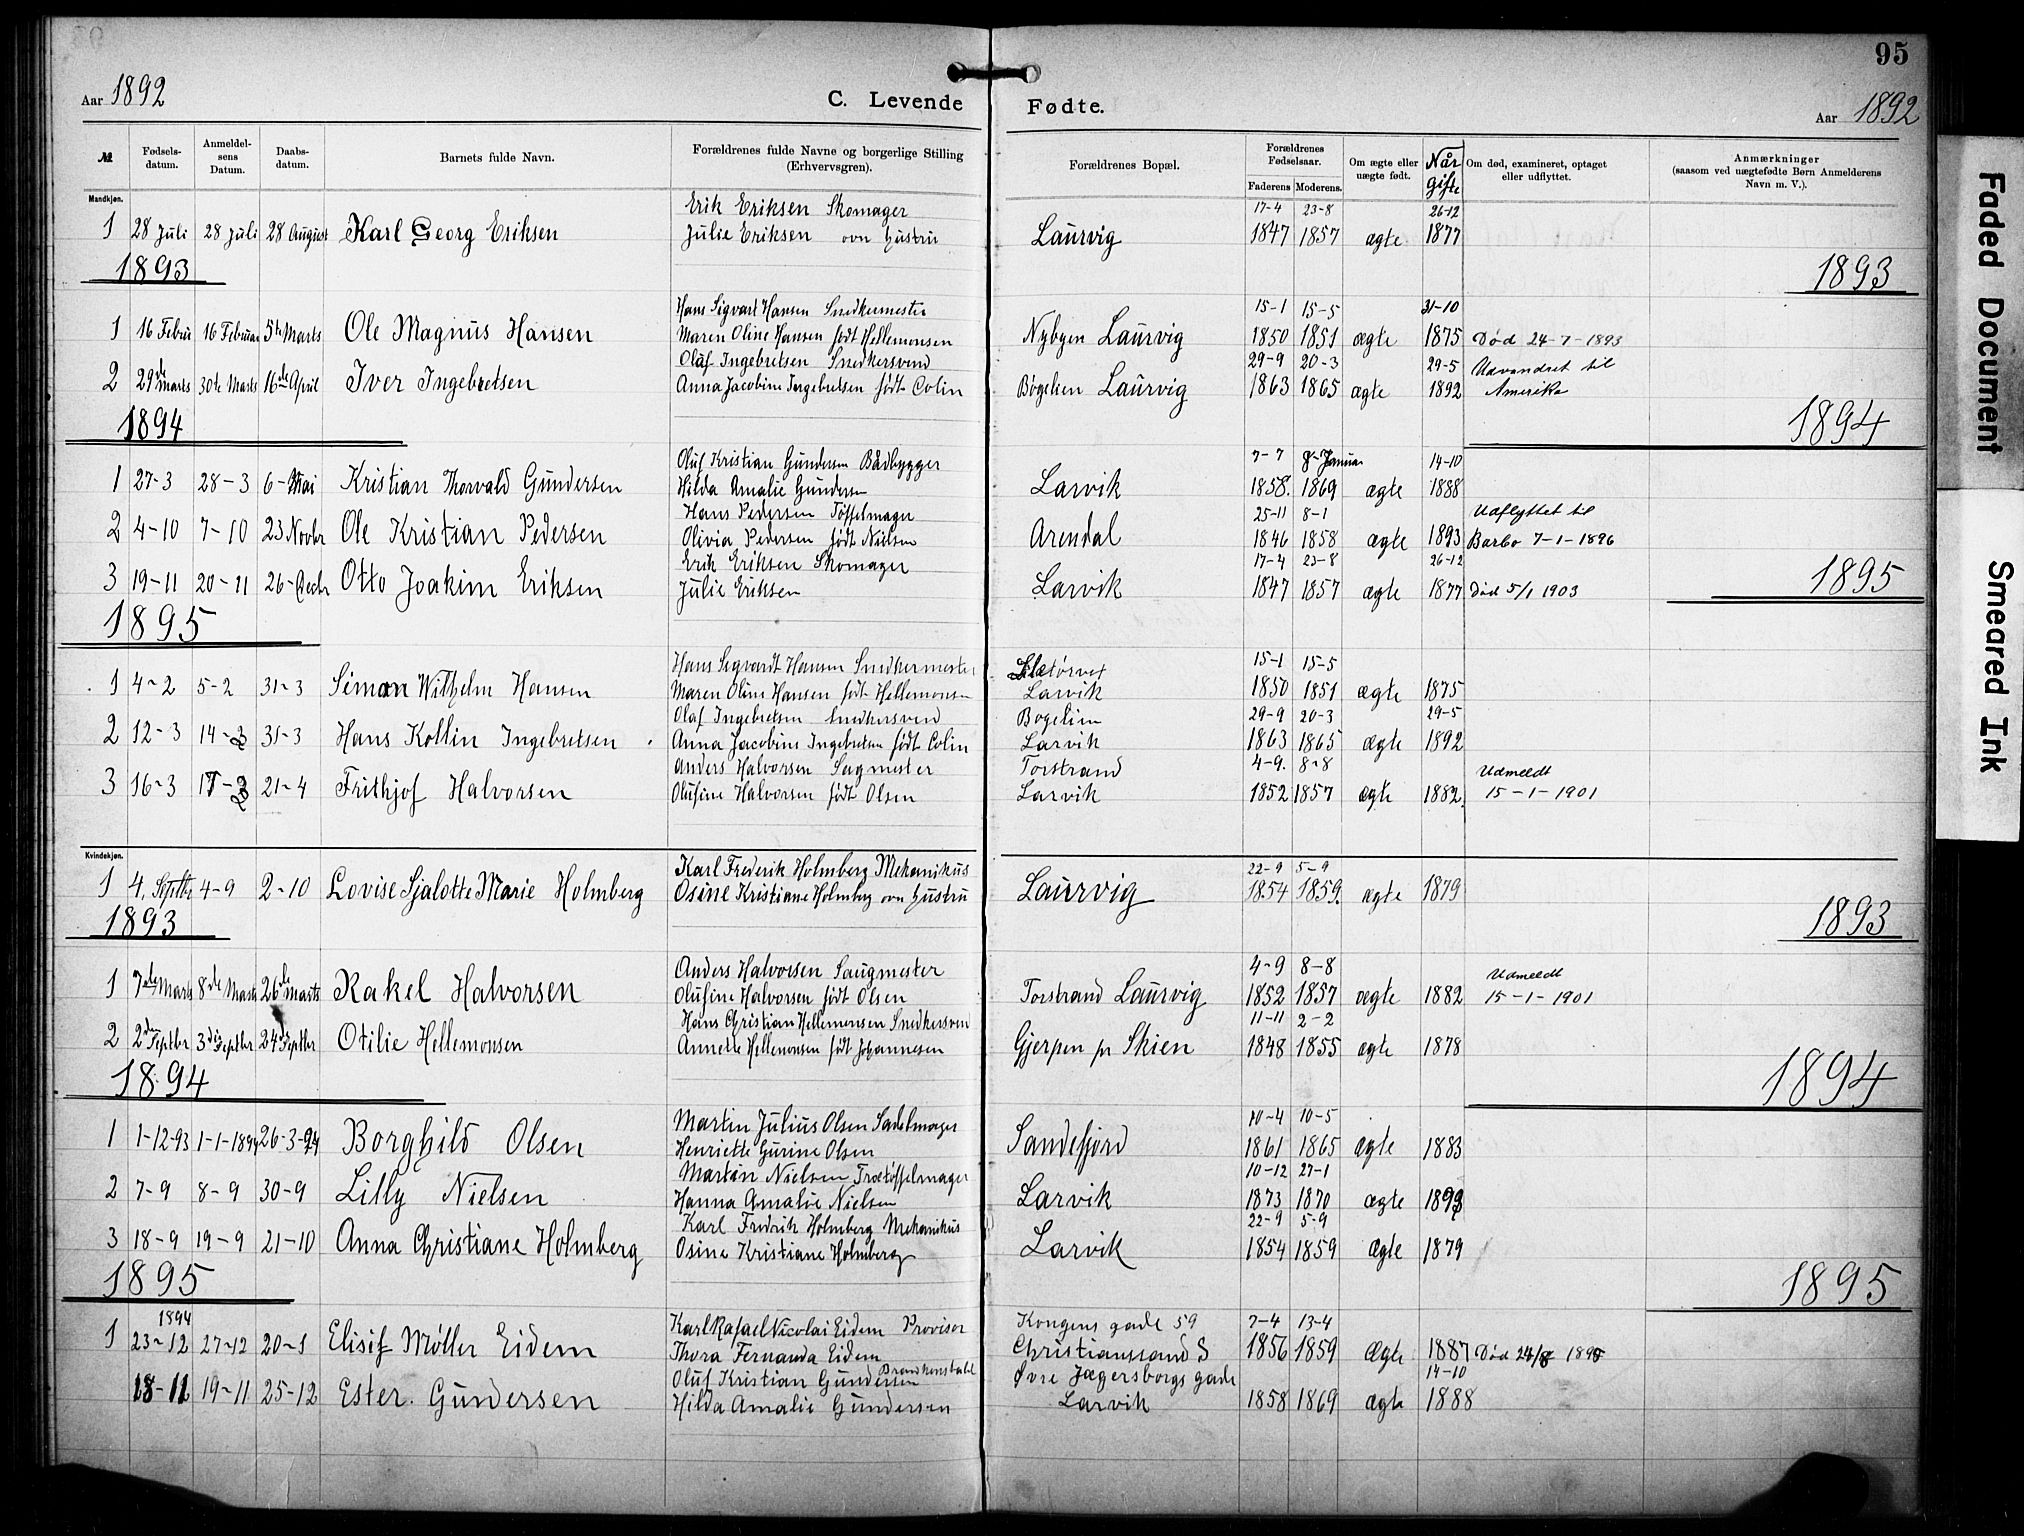 SAKO, Den katolsk-apostoliske menighet i Larvik, F/Fa/L0001: Dissenter register no. 1, 1892-1933, p. 95